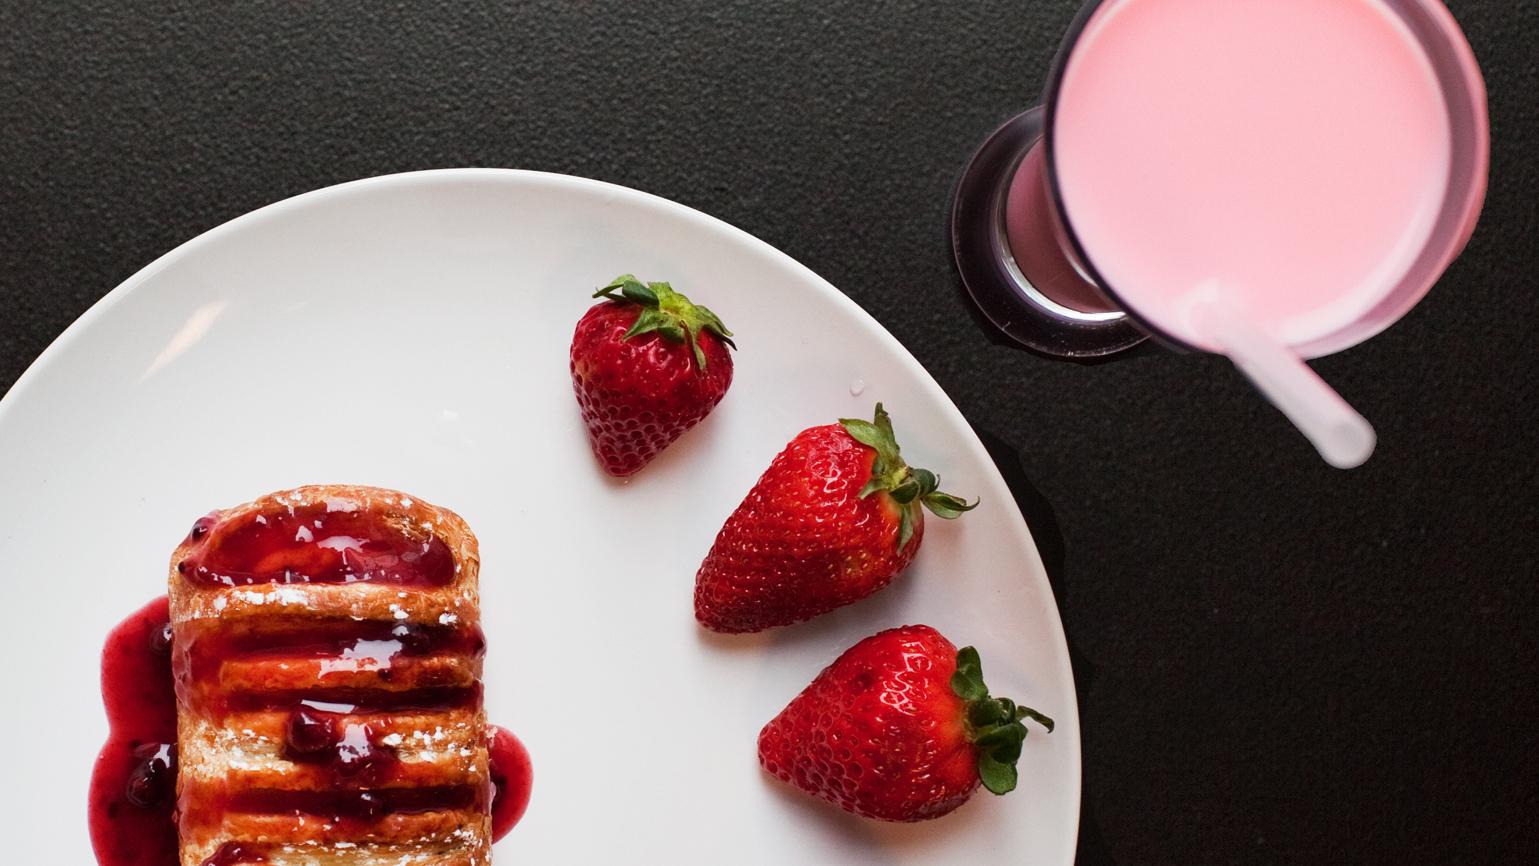 Does Beaver Tush Flavor Your Strawberry Shortcake? We Go Myth Busting